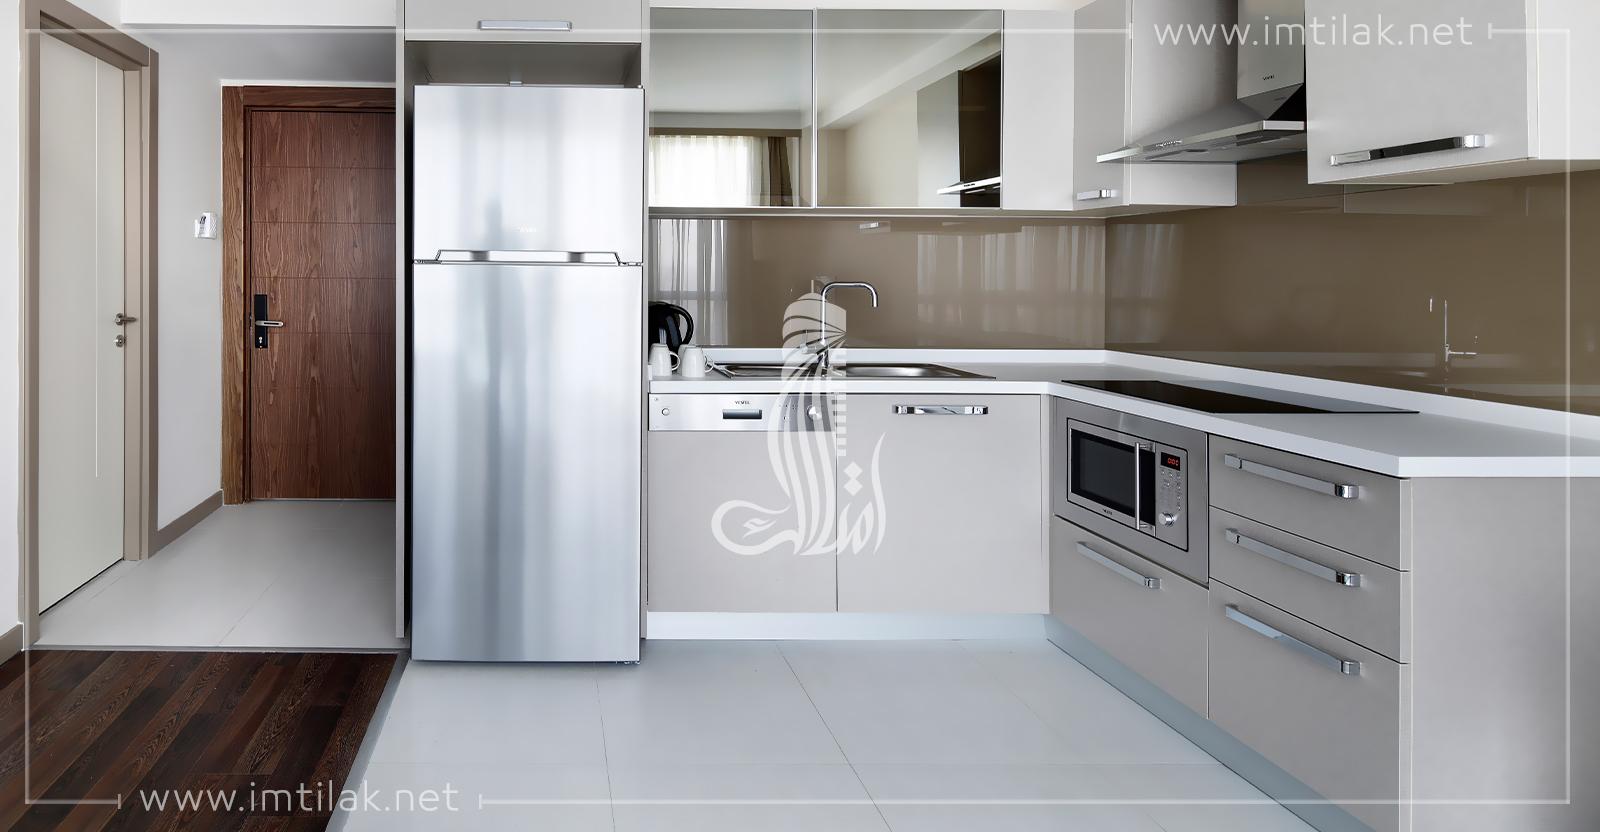 Istanbul Property Investment-Prim Guneshli Project IMT - 214